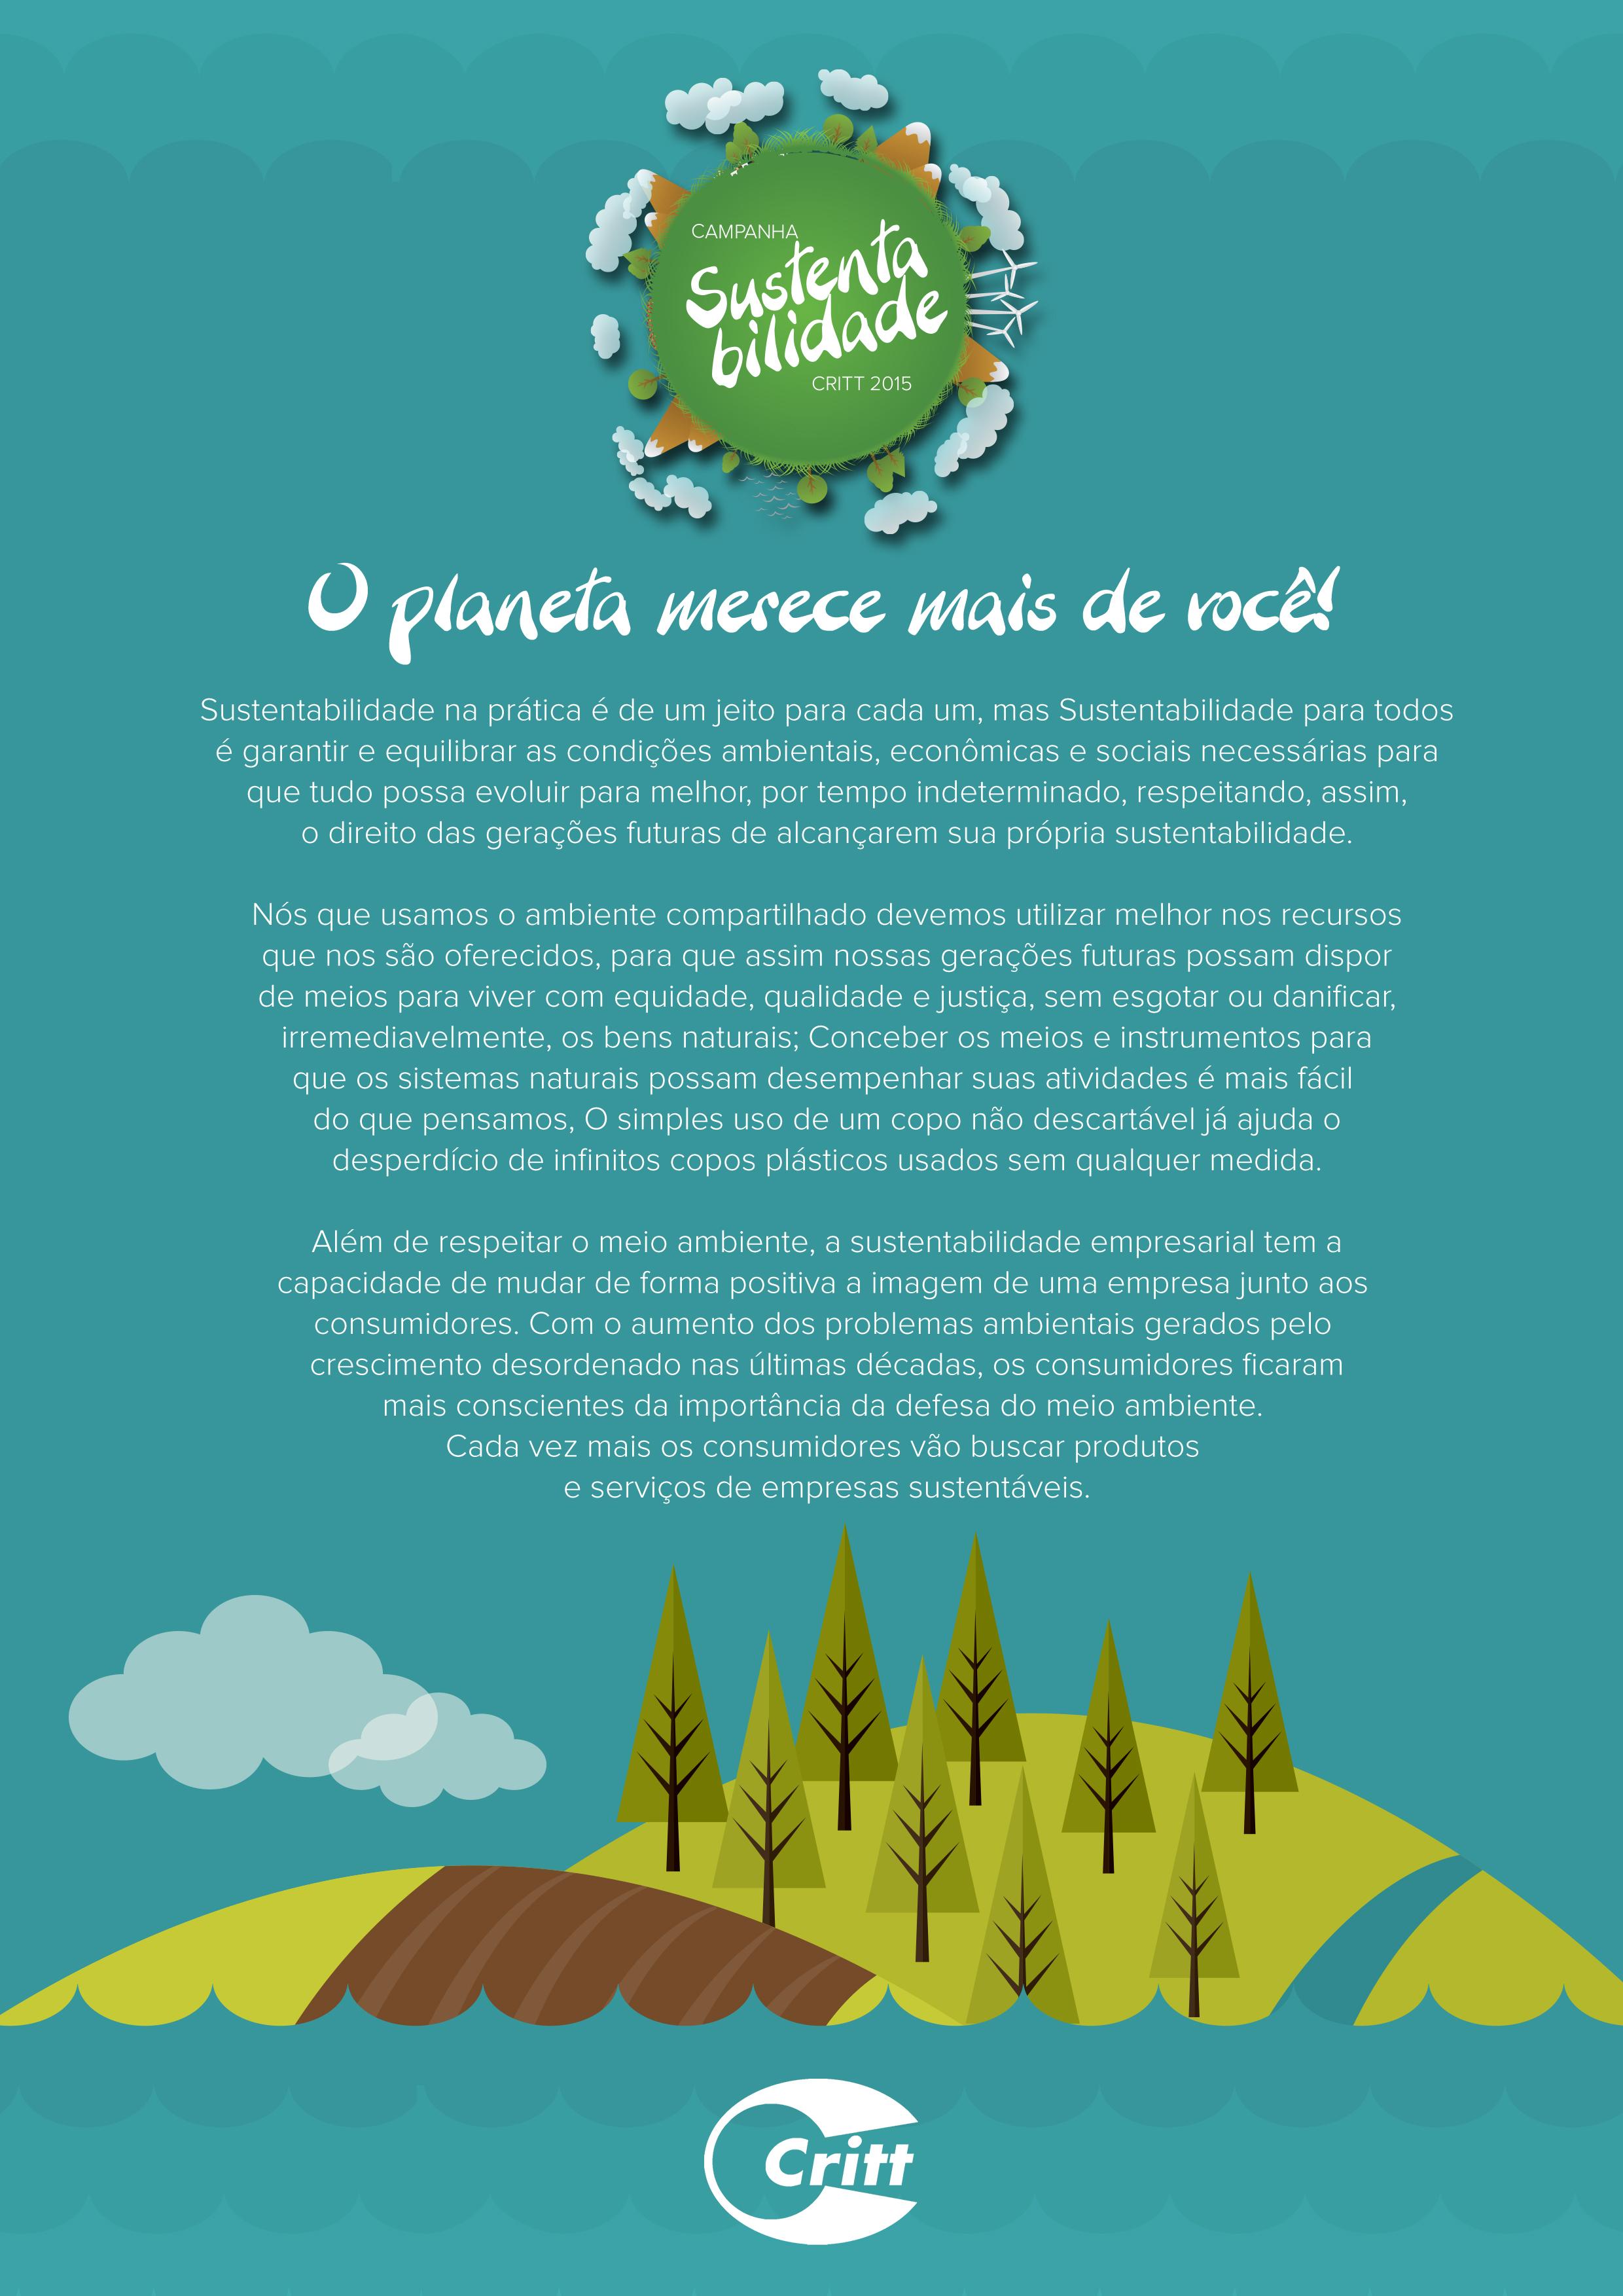 Campanha Sustentabilidade 2015